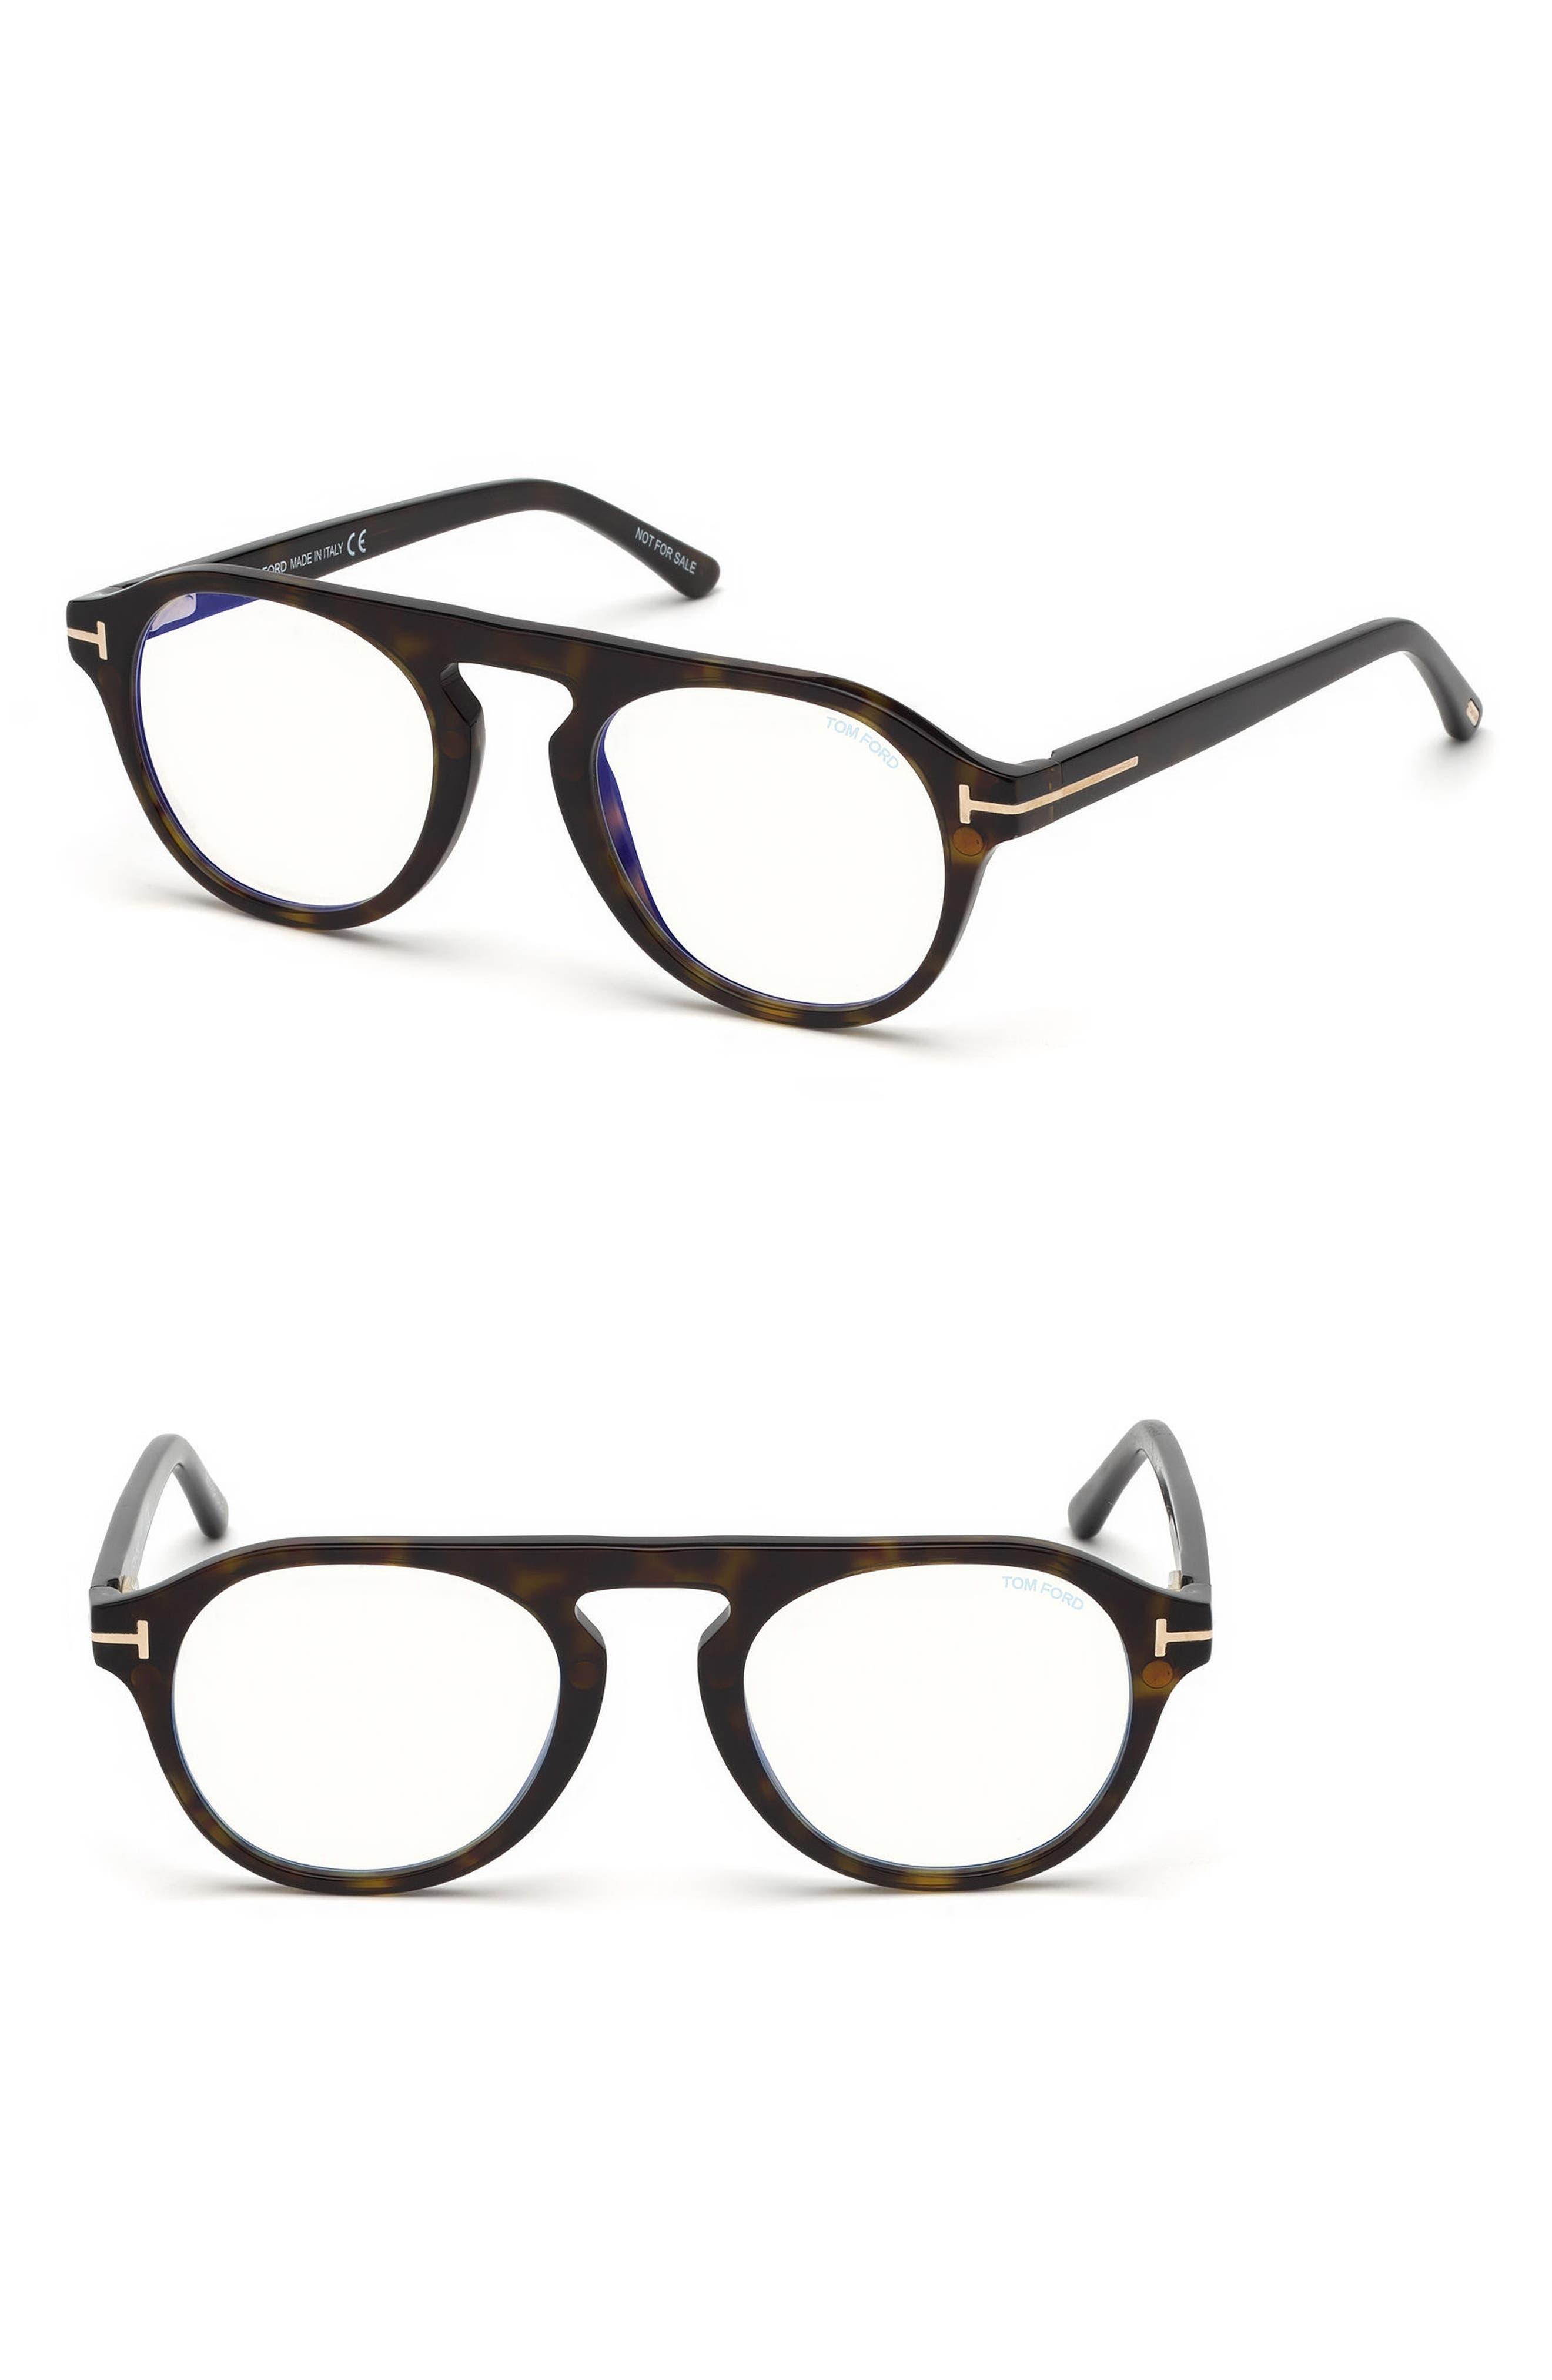 Blueblock 49mm Sunglasses with Clip-On Lens,                             Main thumbnail 1, color,                             Dark Havana